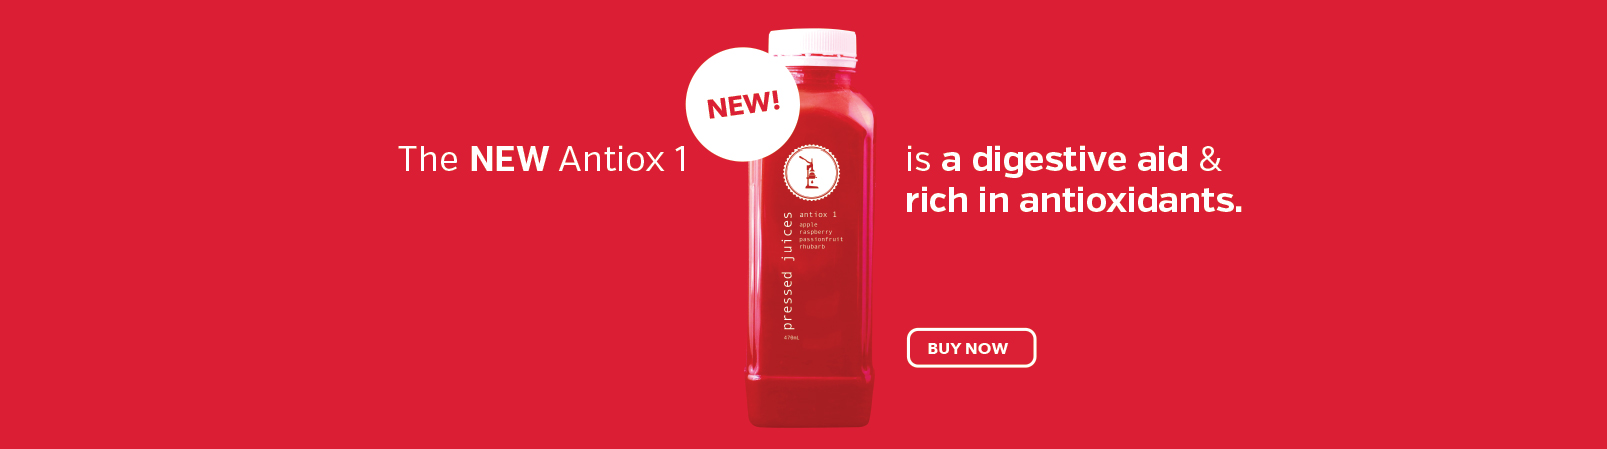 Antiox 1